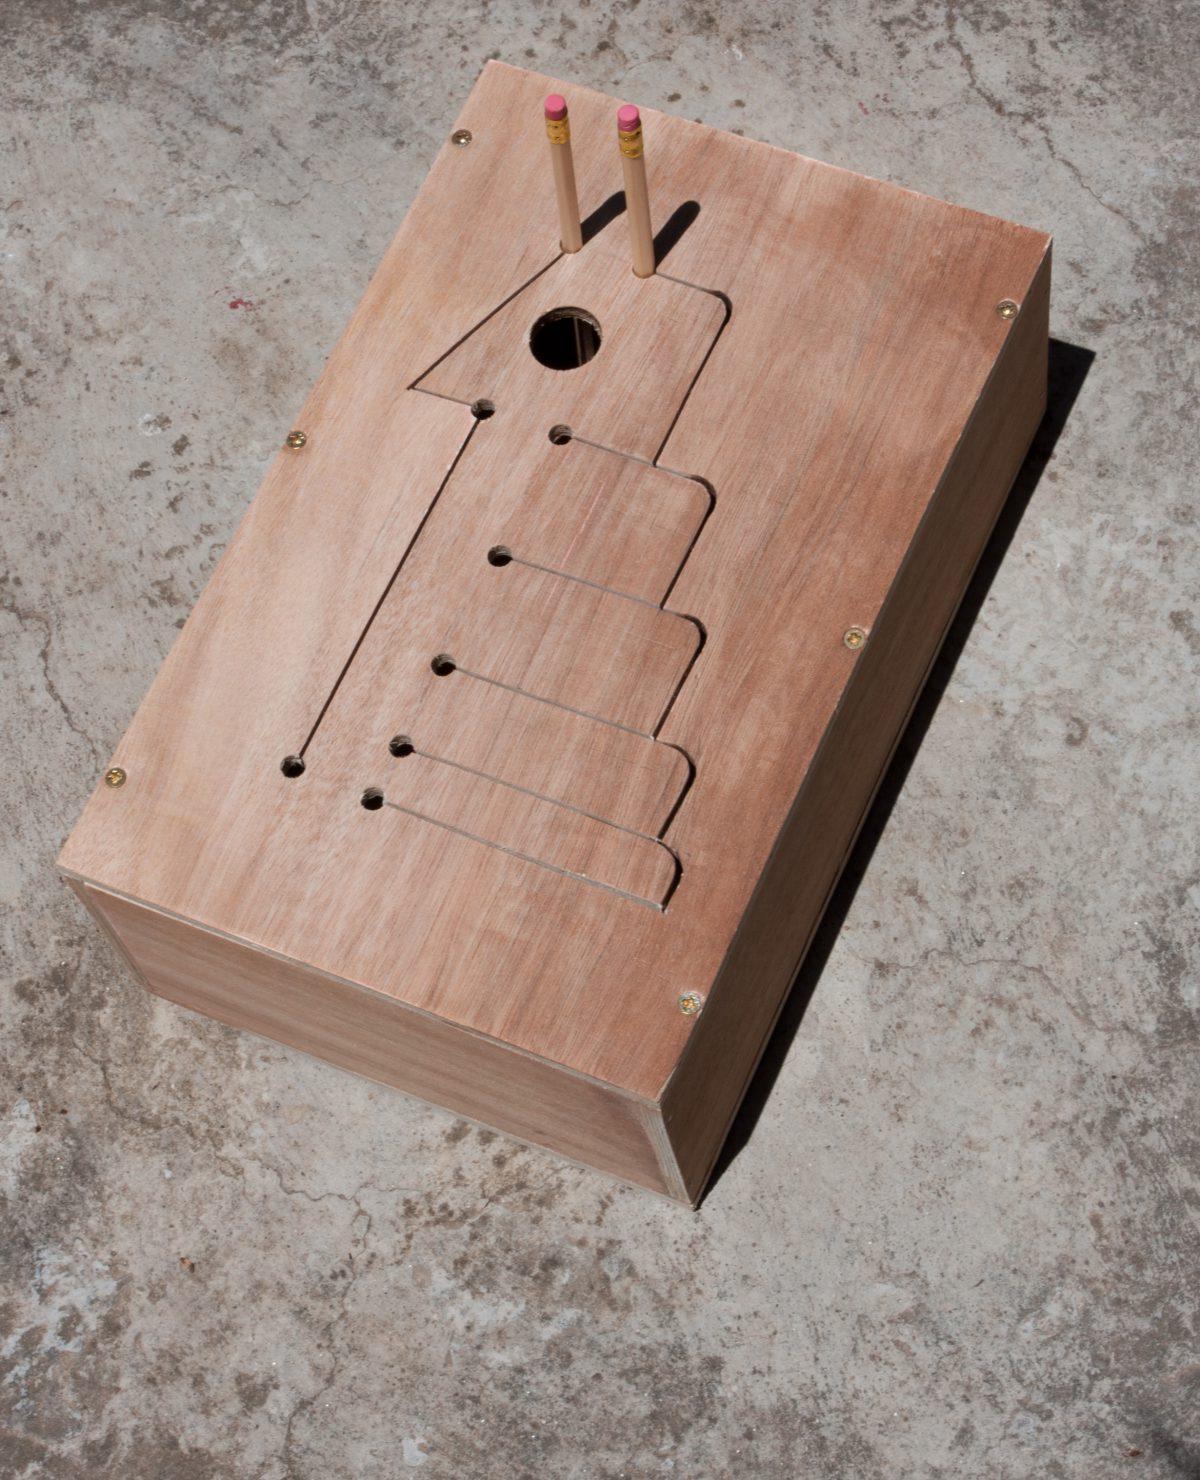 Xylophone - 40x25x10cm, plywood, ch3, wood